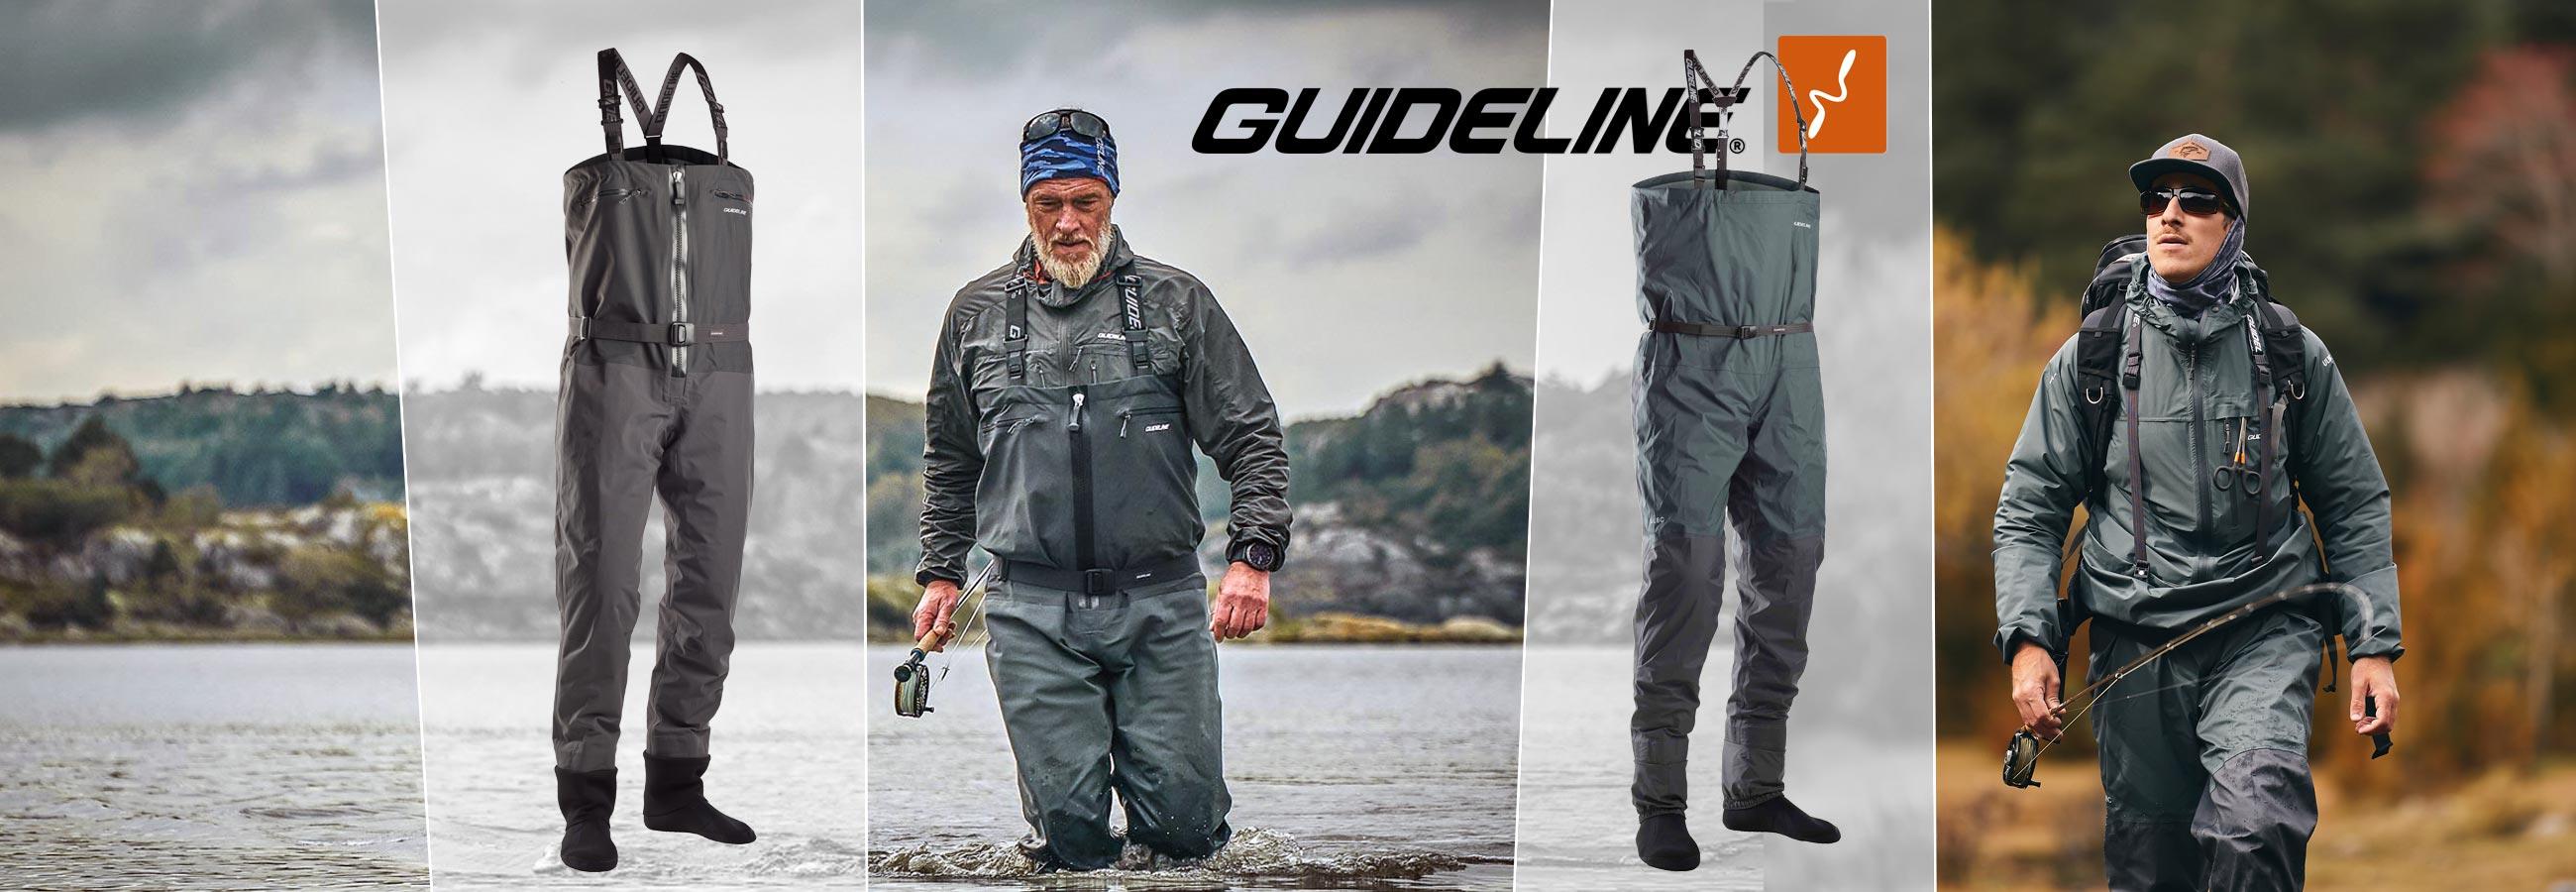 Guideline Wathosen Neu 2021